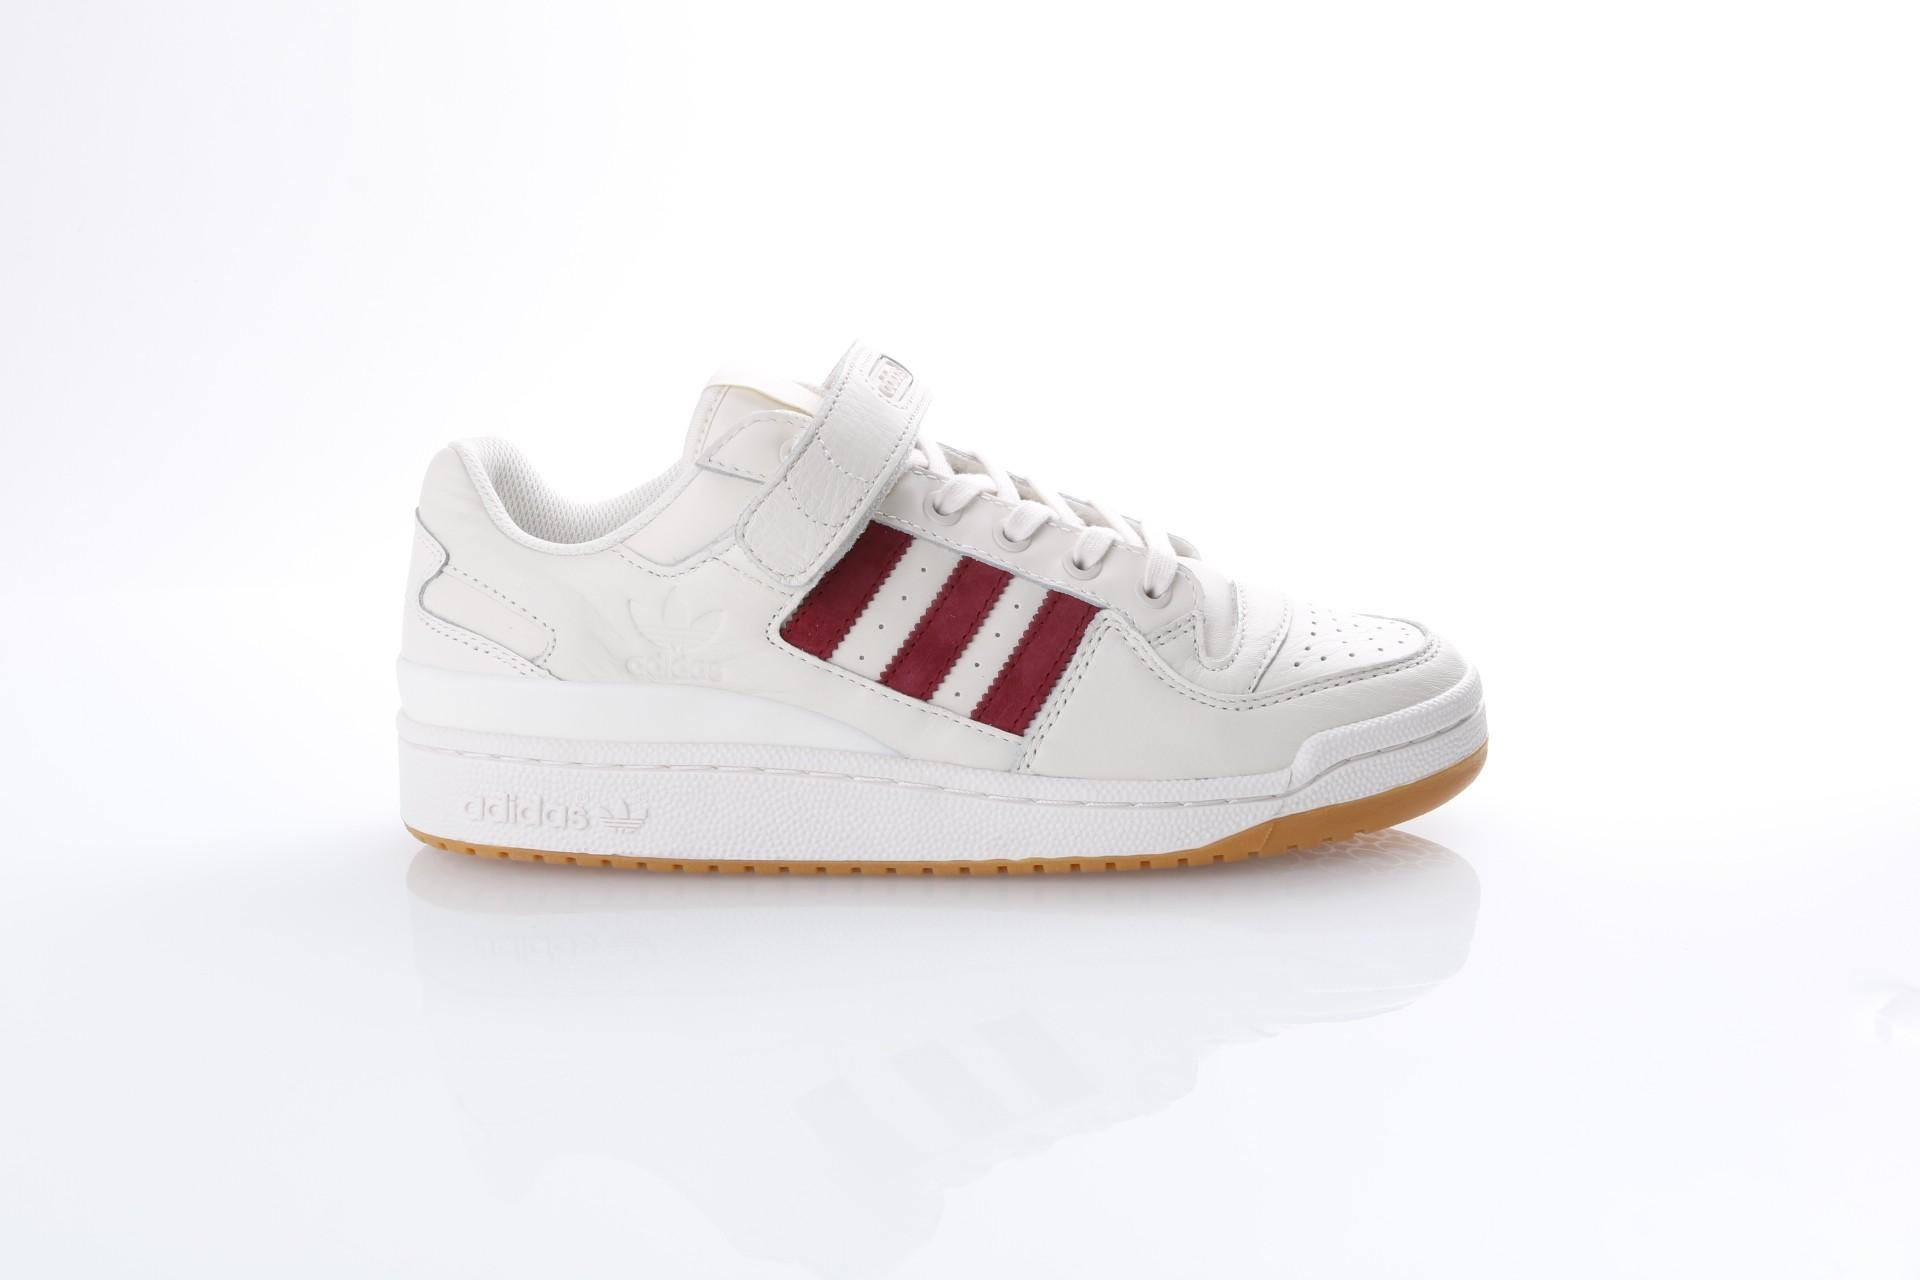 check out 39d22 a8e71 Adidas Originals CQ0997 Sneakers Forum low Wit